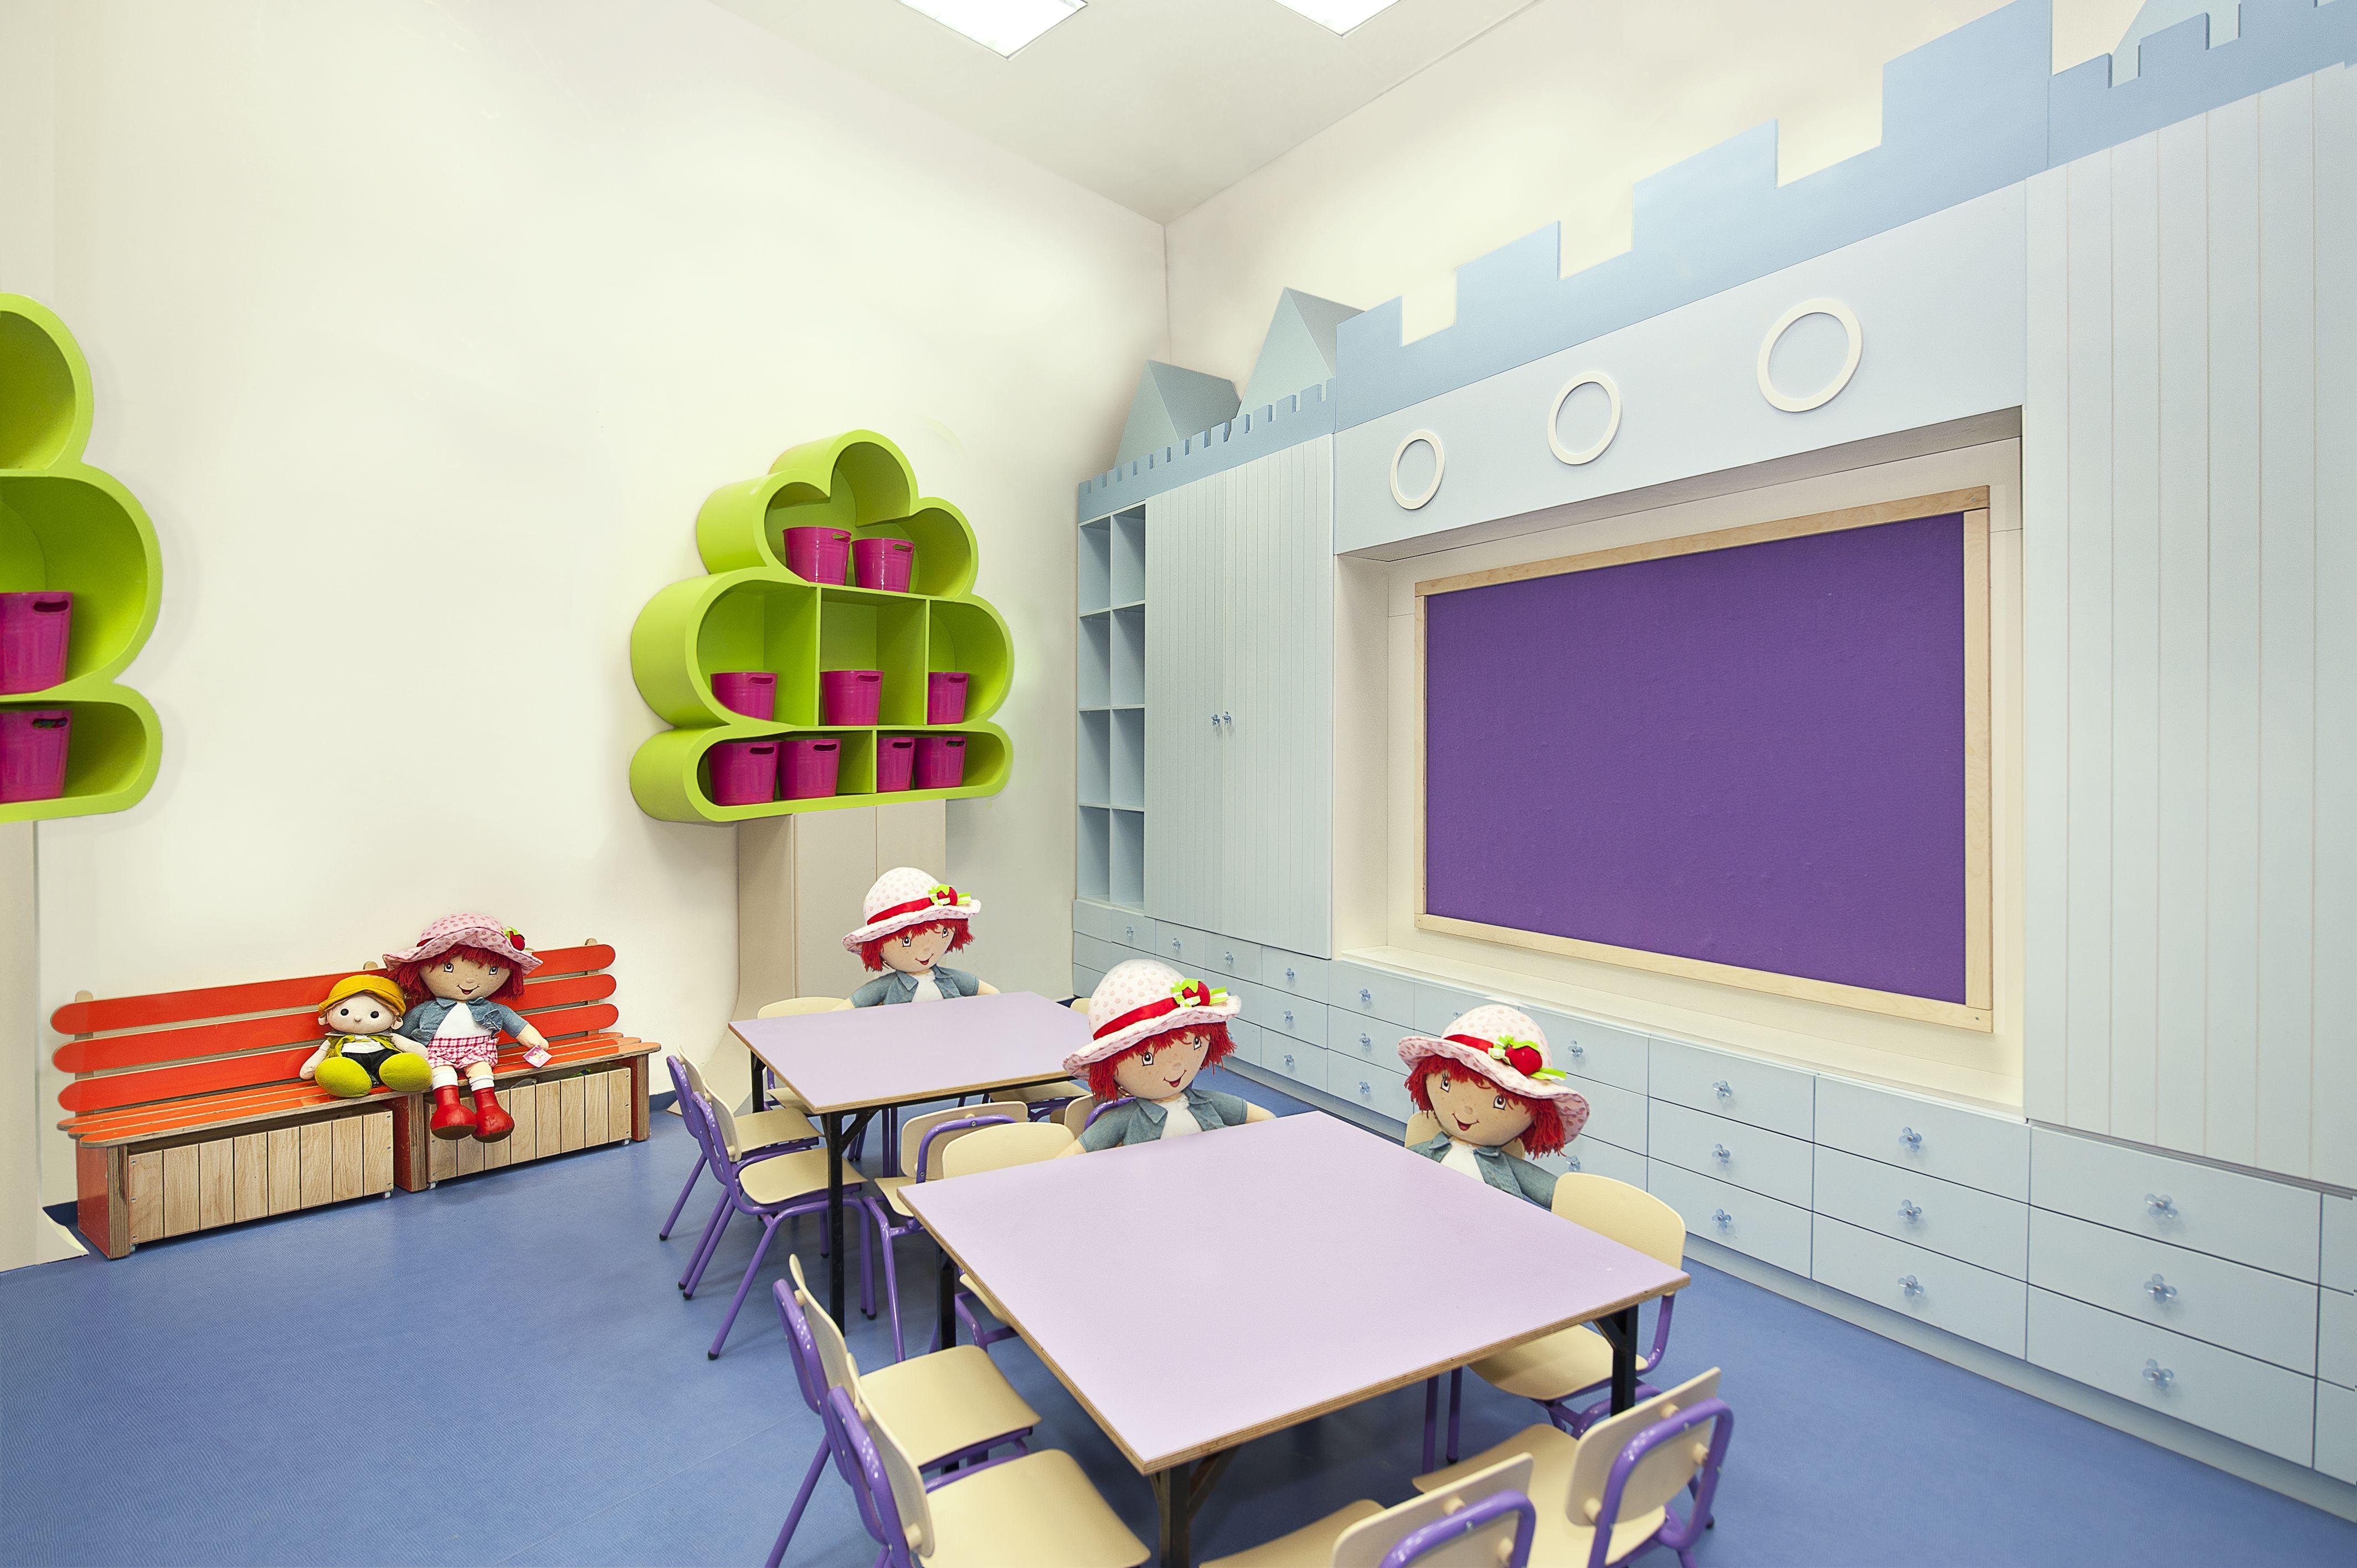 Kindergarten interior design image in 3d - Design Kindergarten Hledat Googlem Design Kinder Pinterest Daycare Design Sinks And Modern